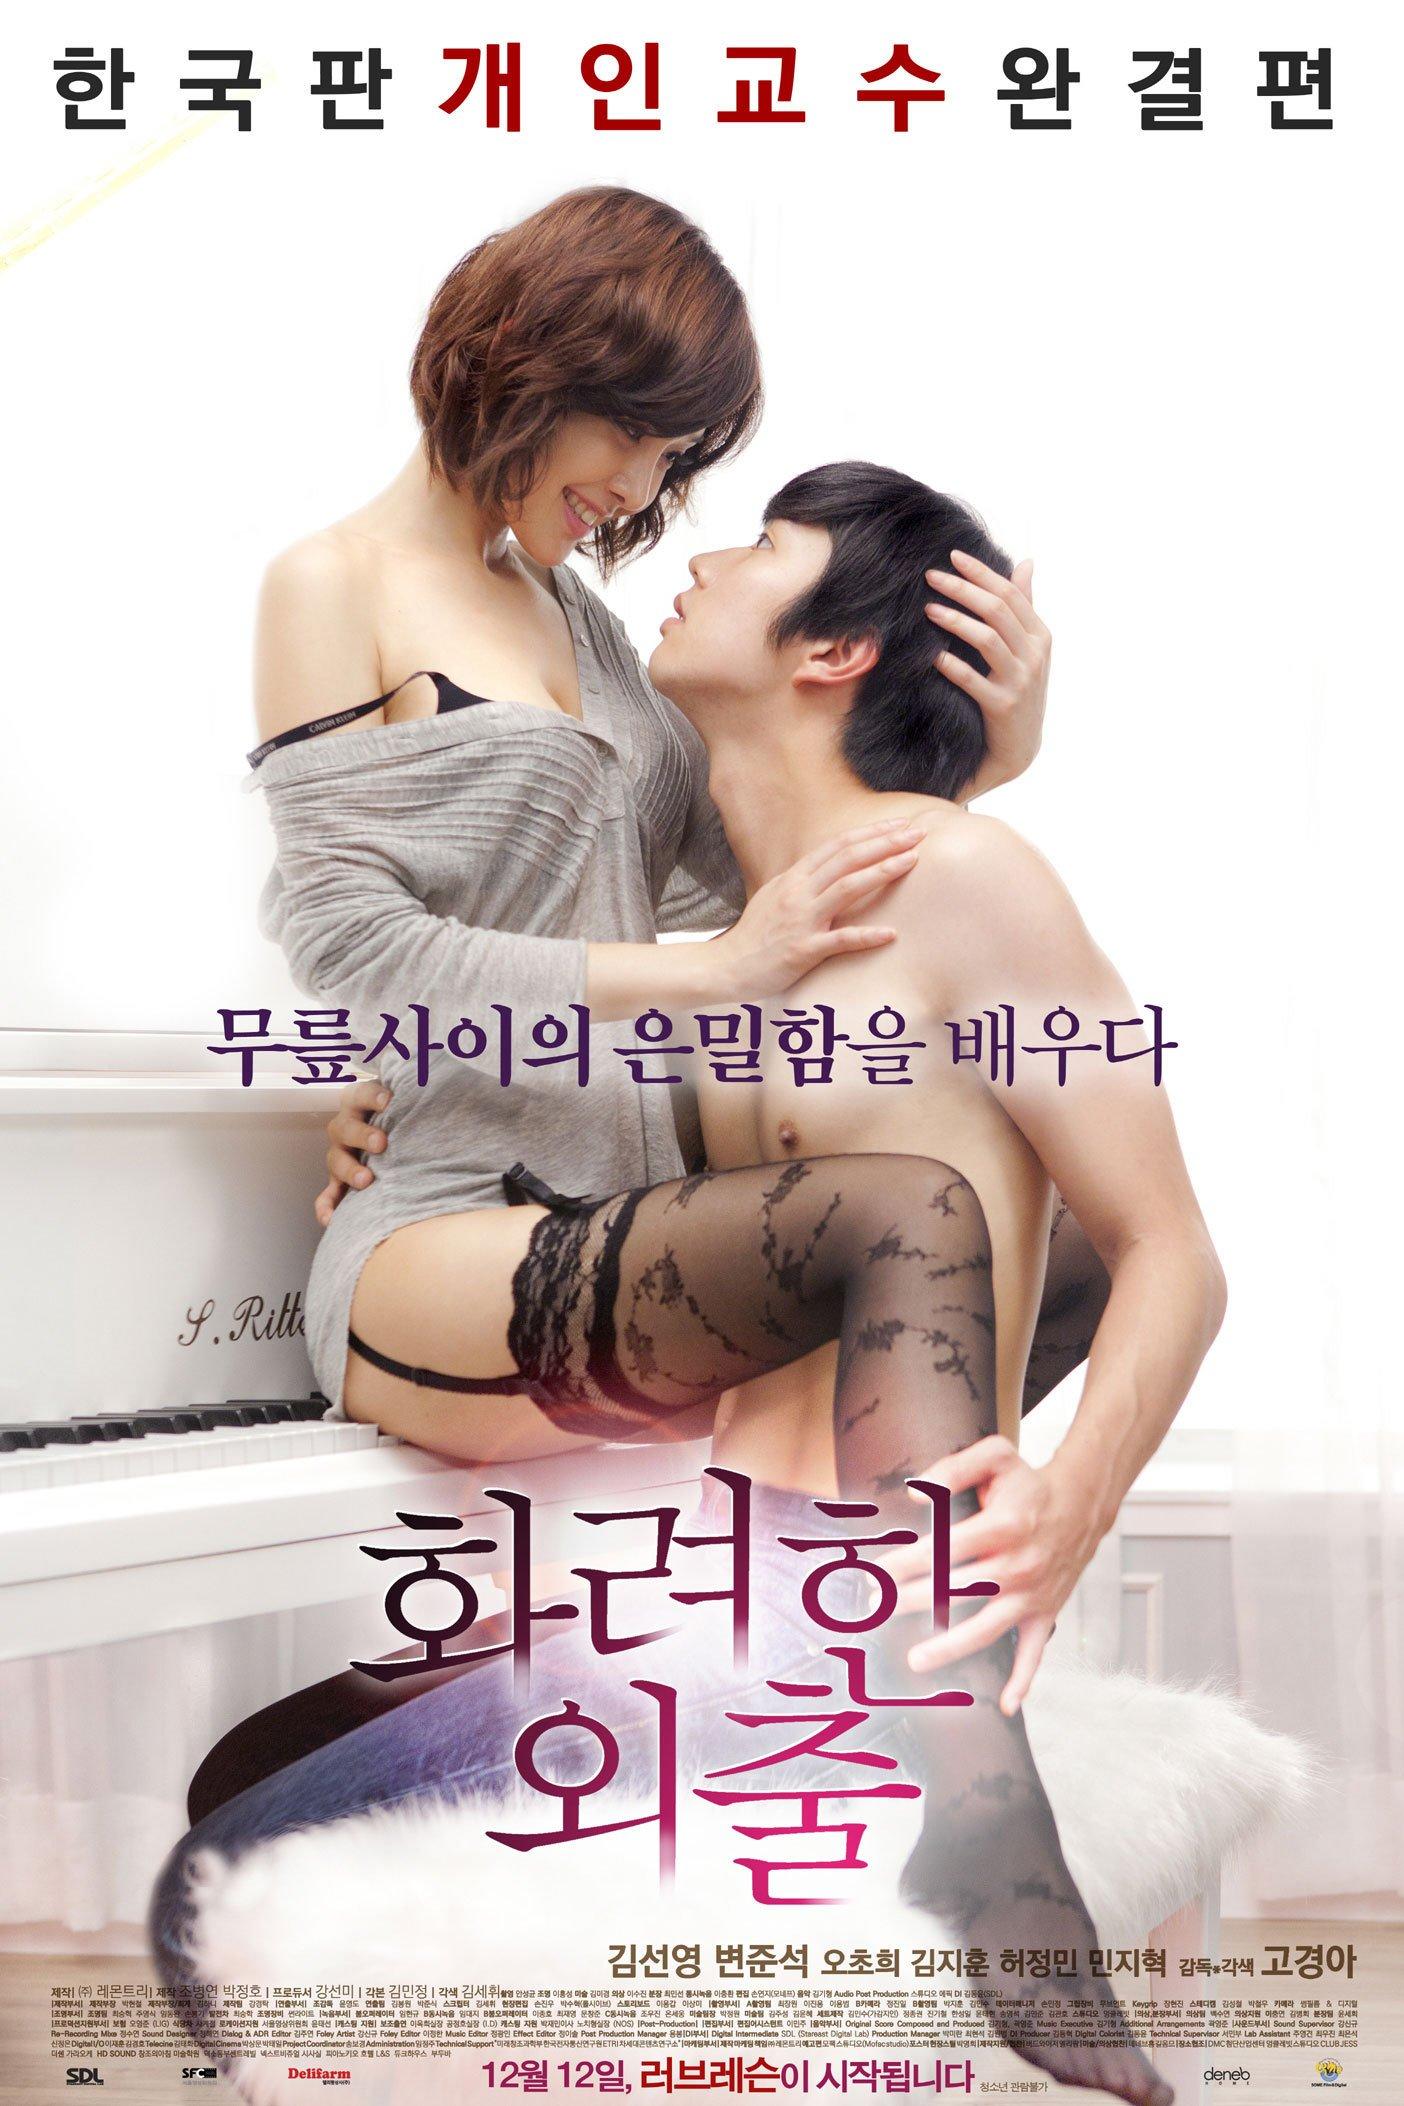 koreyskie-porno-filmi-s-perevodom